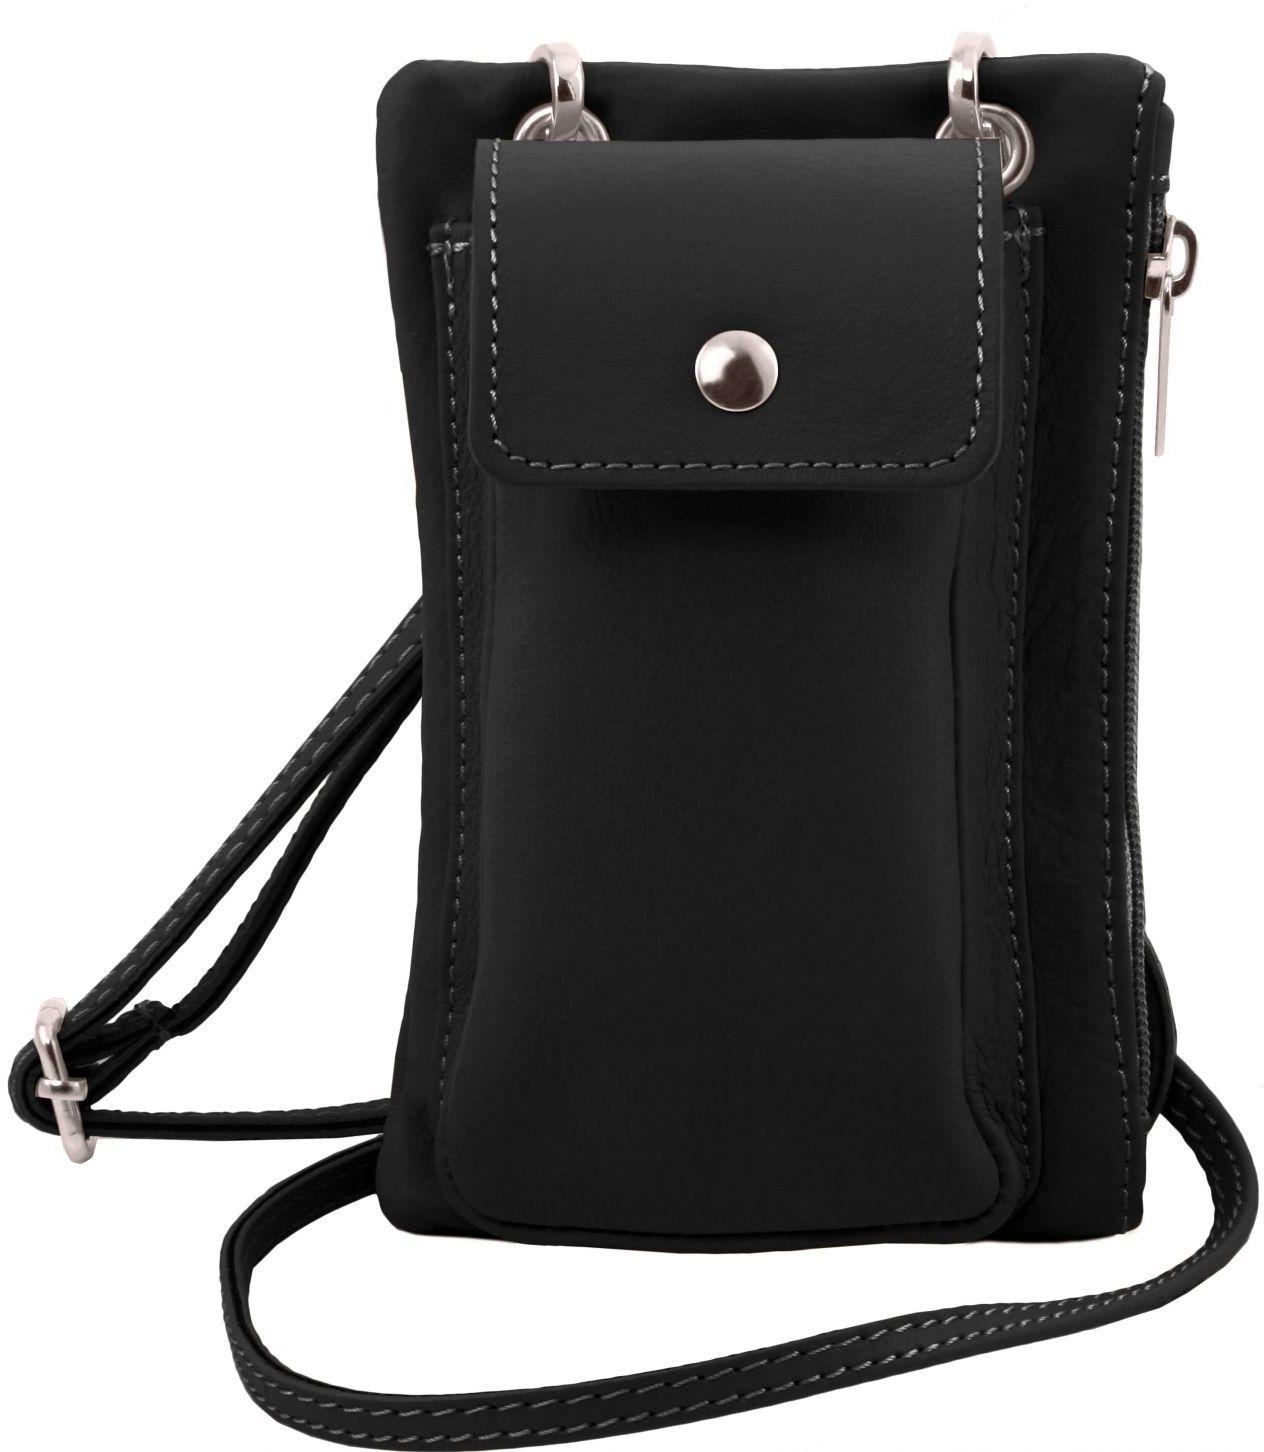 Unisex Τσαντάκι Δερμάτινο Mini Cross TL141423 Μαύρο Tuscany Leather γυναίκα   τσάντες ώμου   χειρός